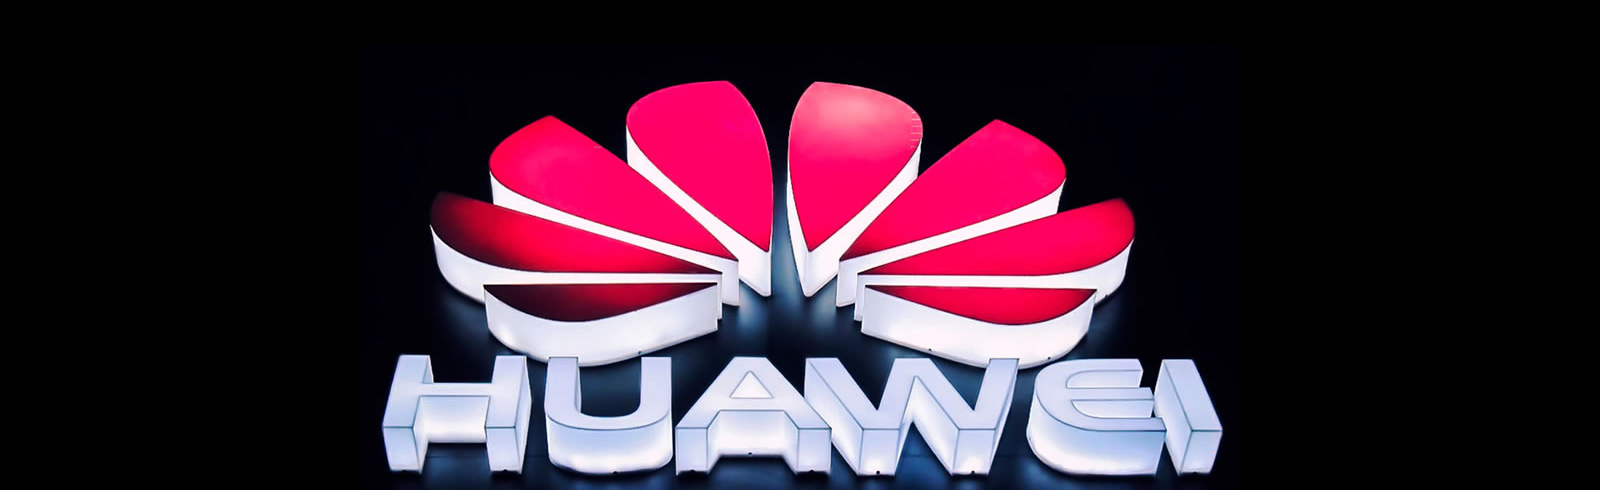 Huawei registers Huawei ARK OS as a trademark in Germany